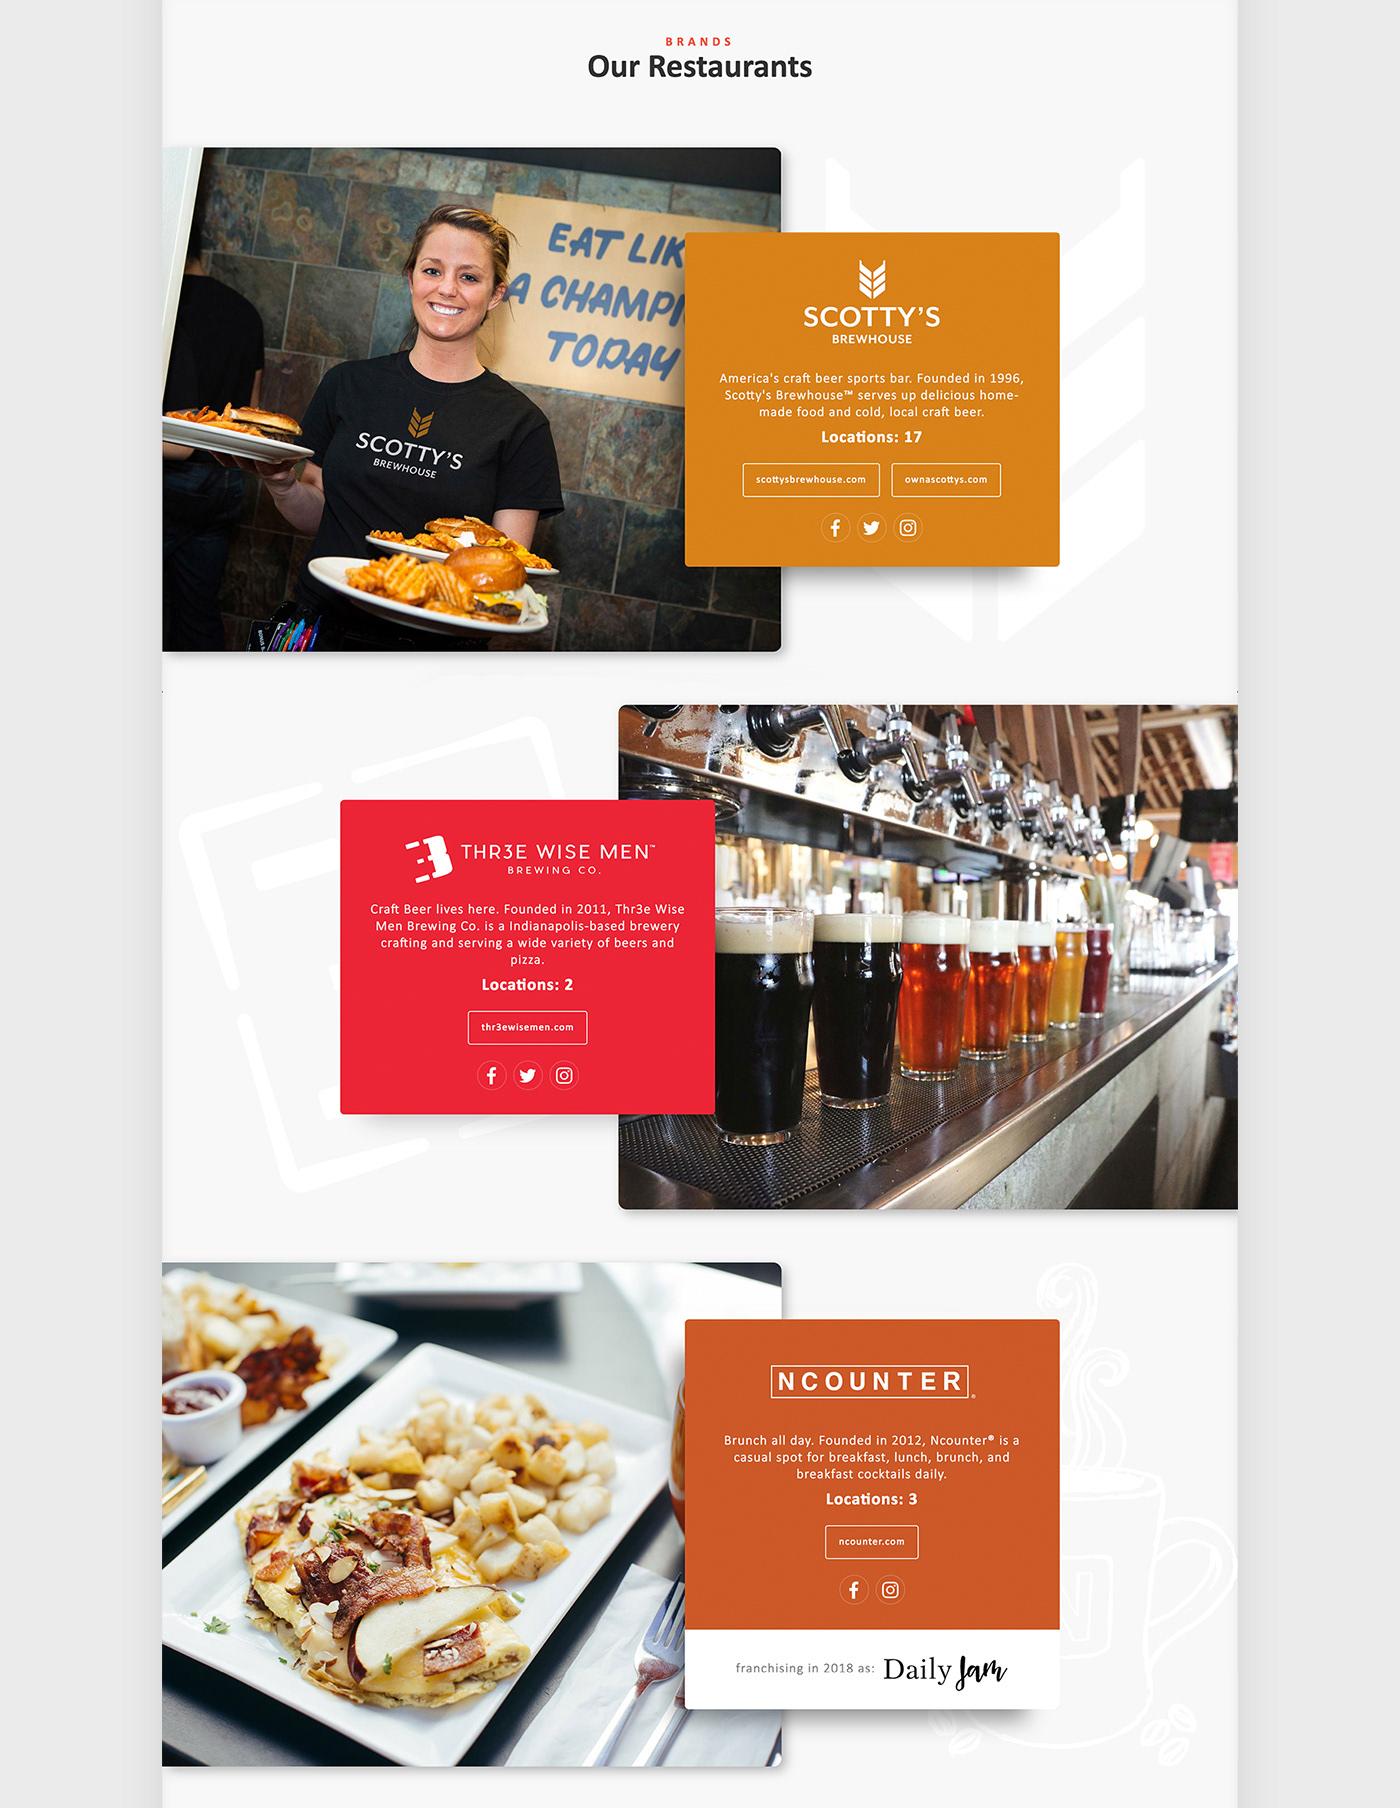 ui design,UX design,Web Design ,restaurants,Press Releases,news site,Webflow